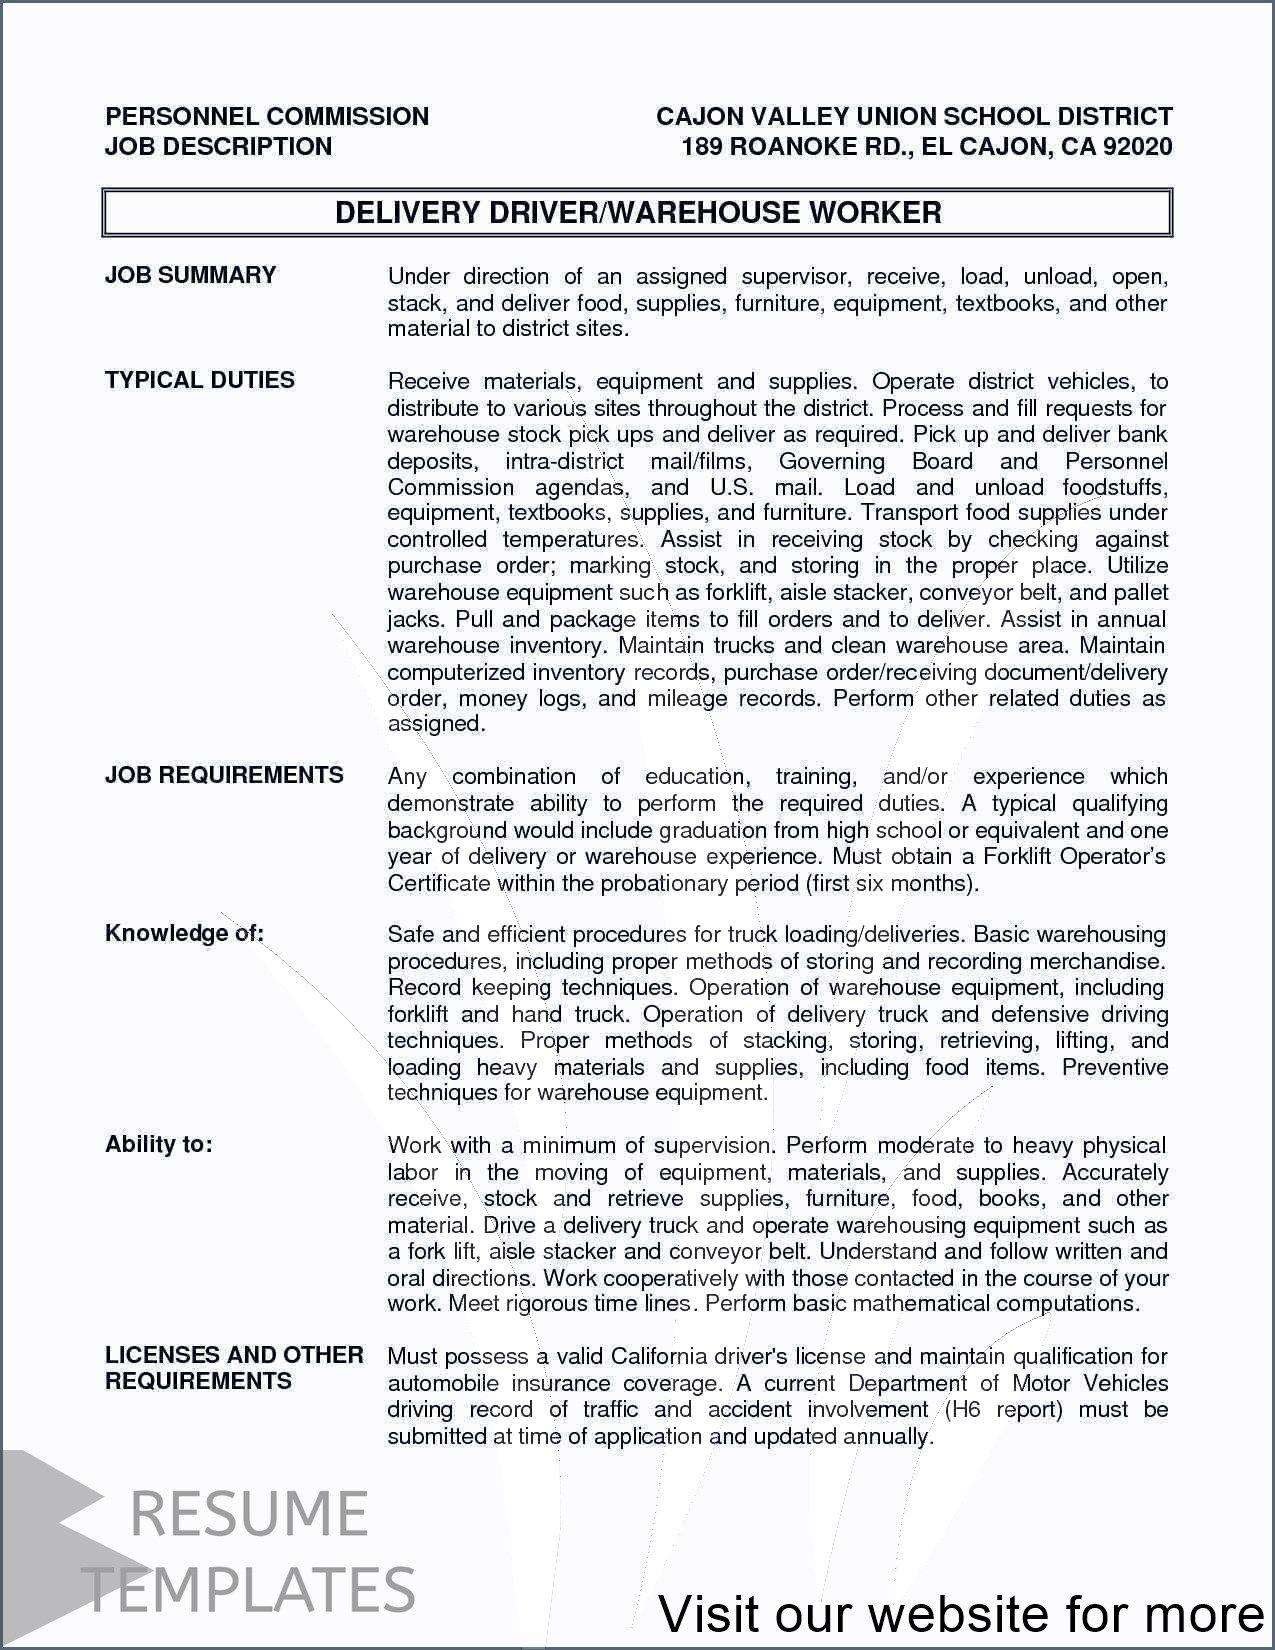 Resume Template Reddit Professional Job Description Resume Template Job Interview Tips